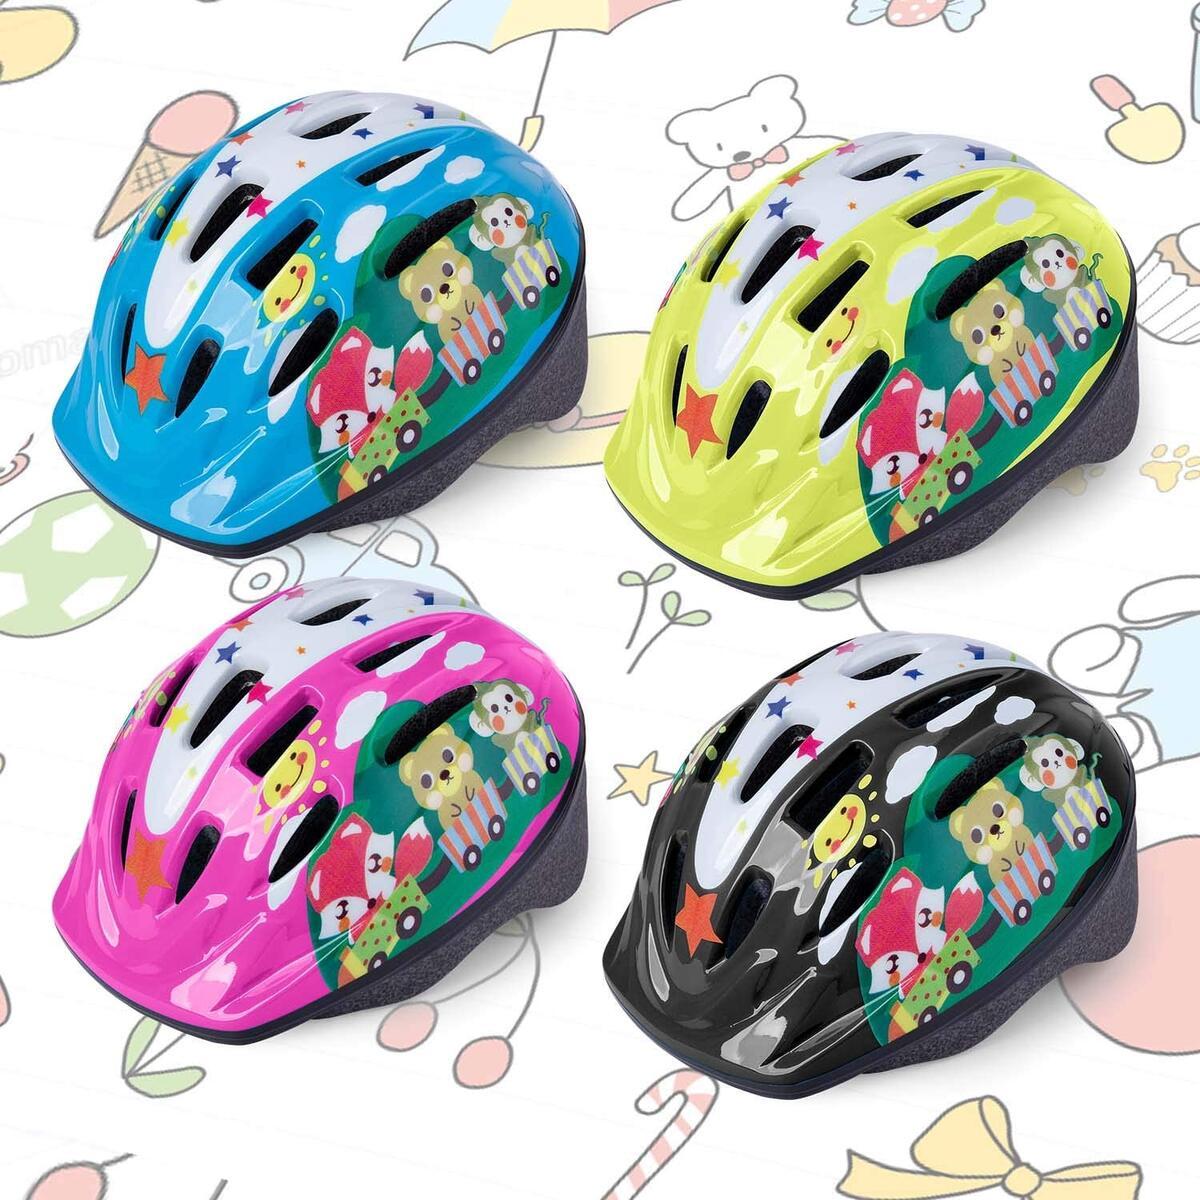 Toddler Bike Helmet, CPSC Certified Multi-Sport Adjustable Helmet for Kids Boys and Girls Age 3-5 [Choose any color]